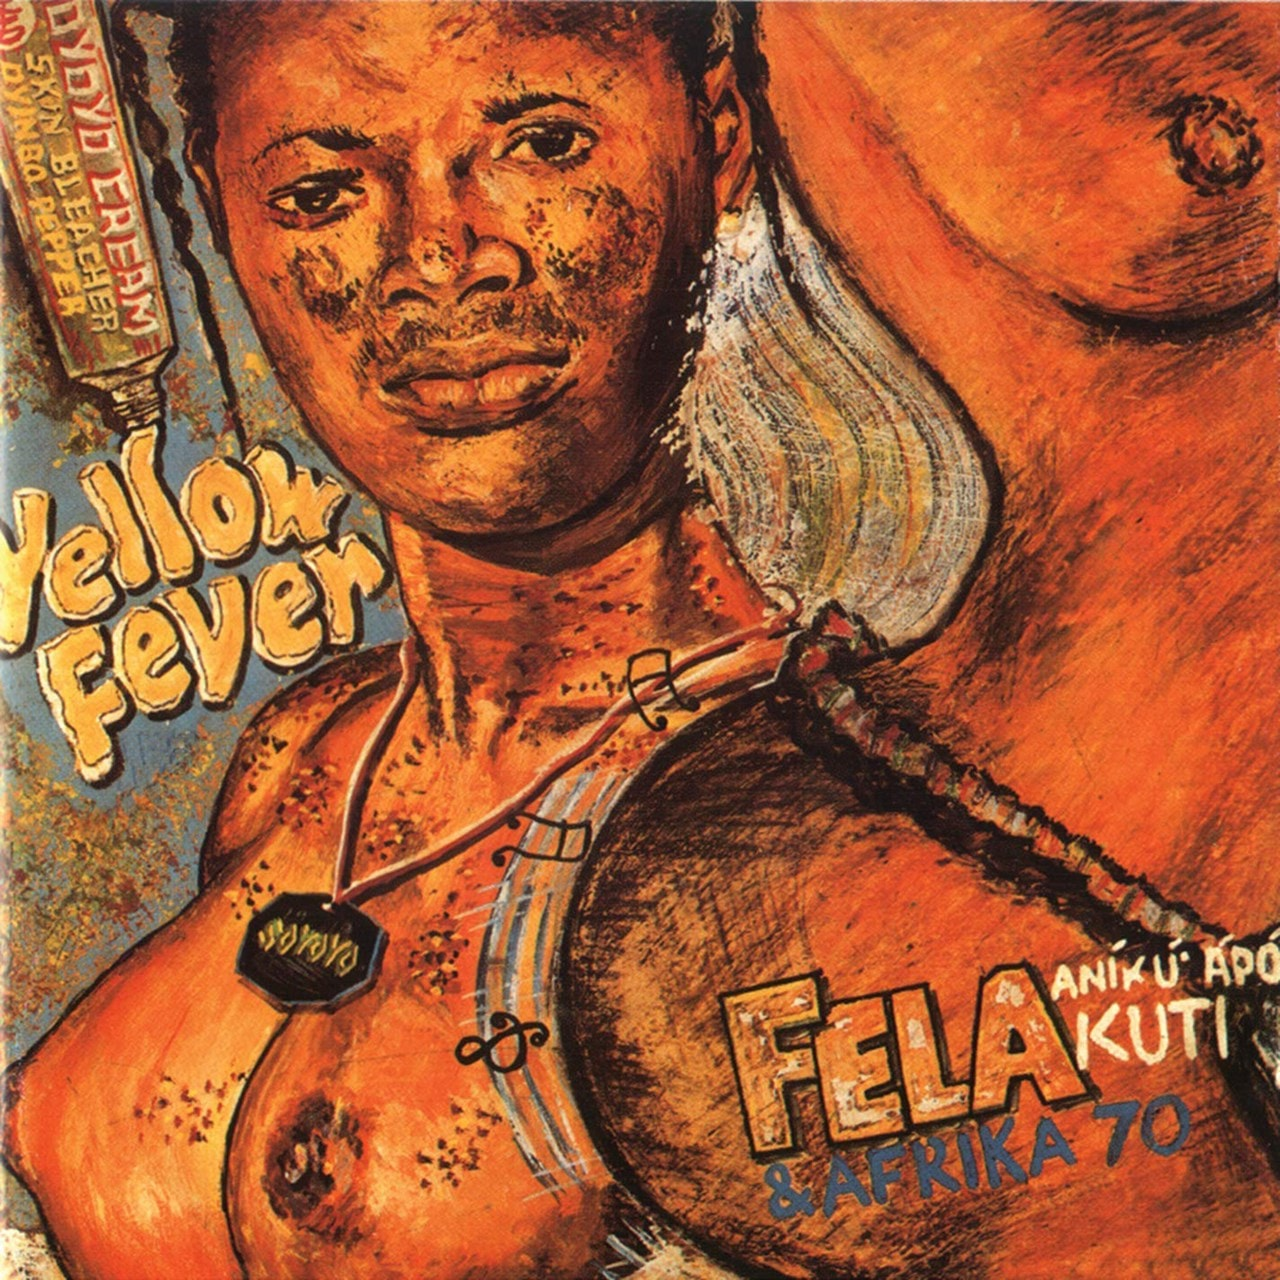 Yellow Fever - 1